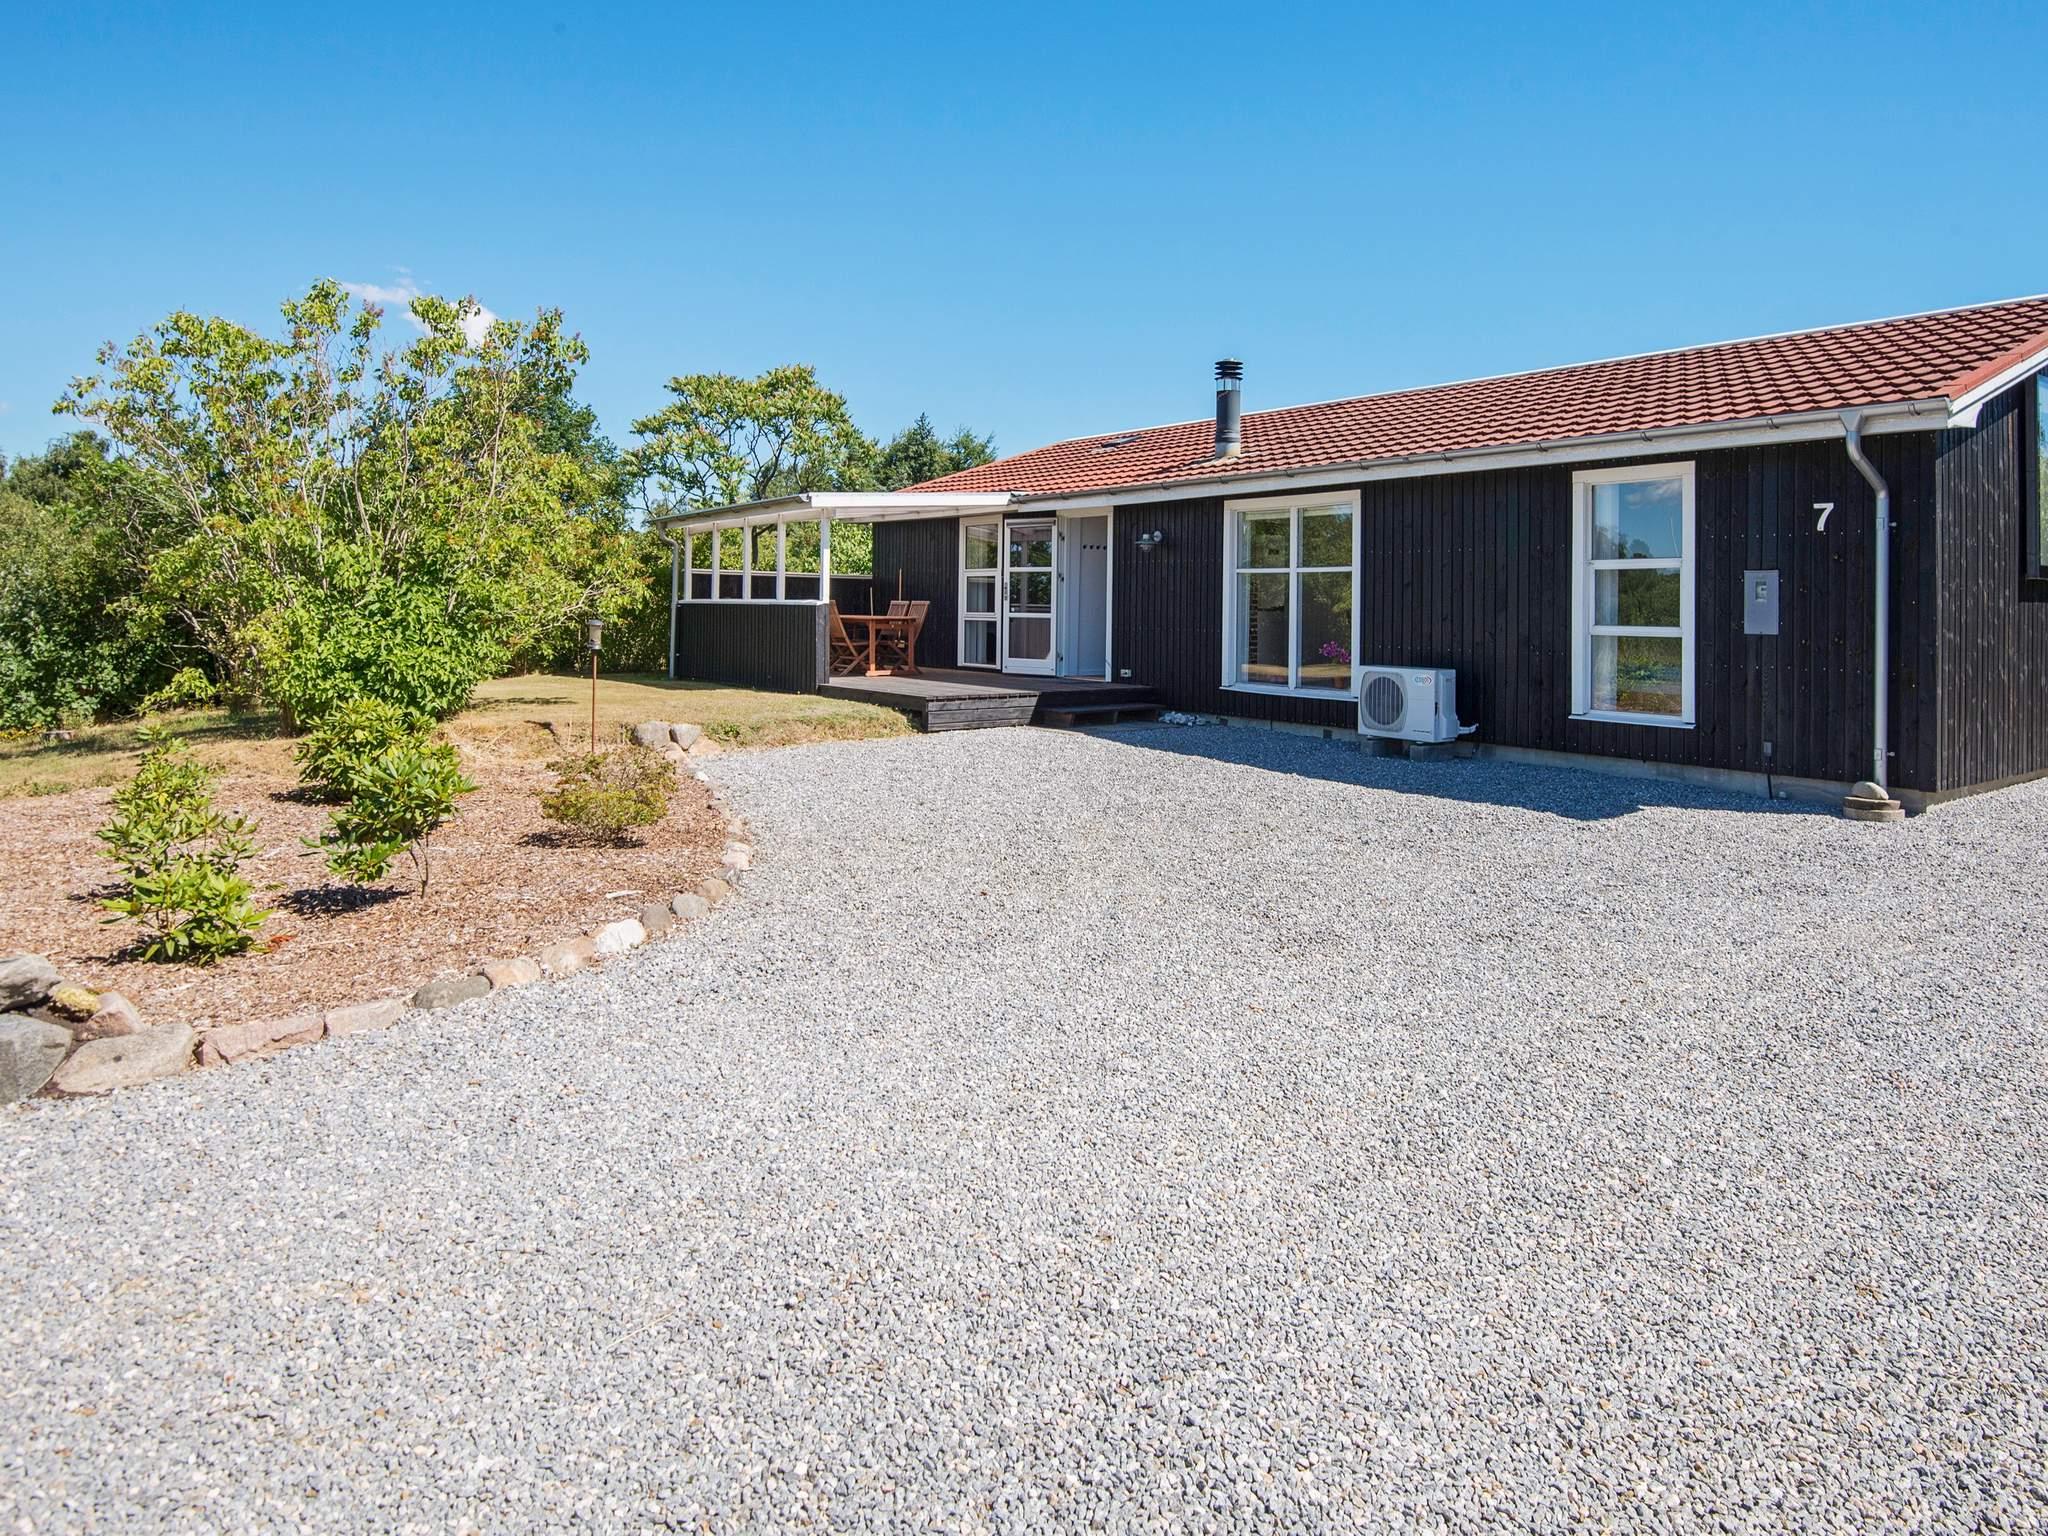 Maison de vacances Helgenæs (978615), Knebel, , Jutland Est, Danemark, image 13